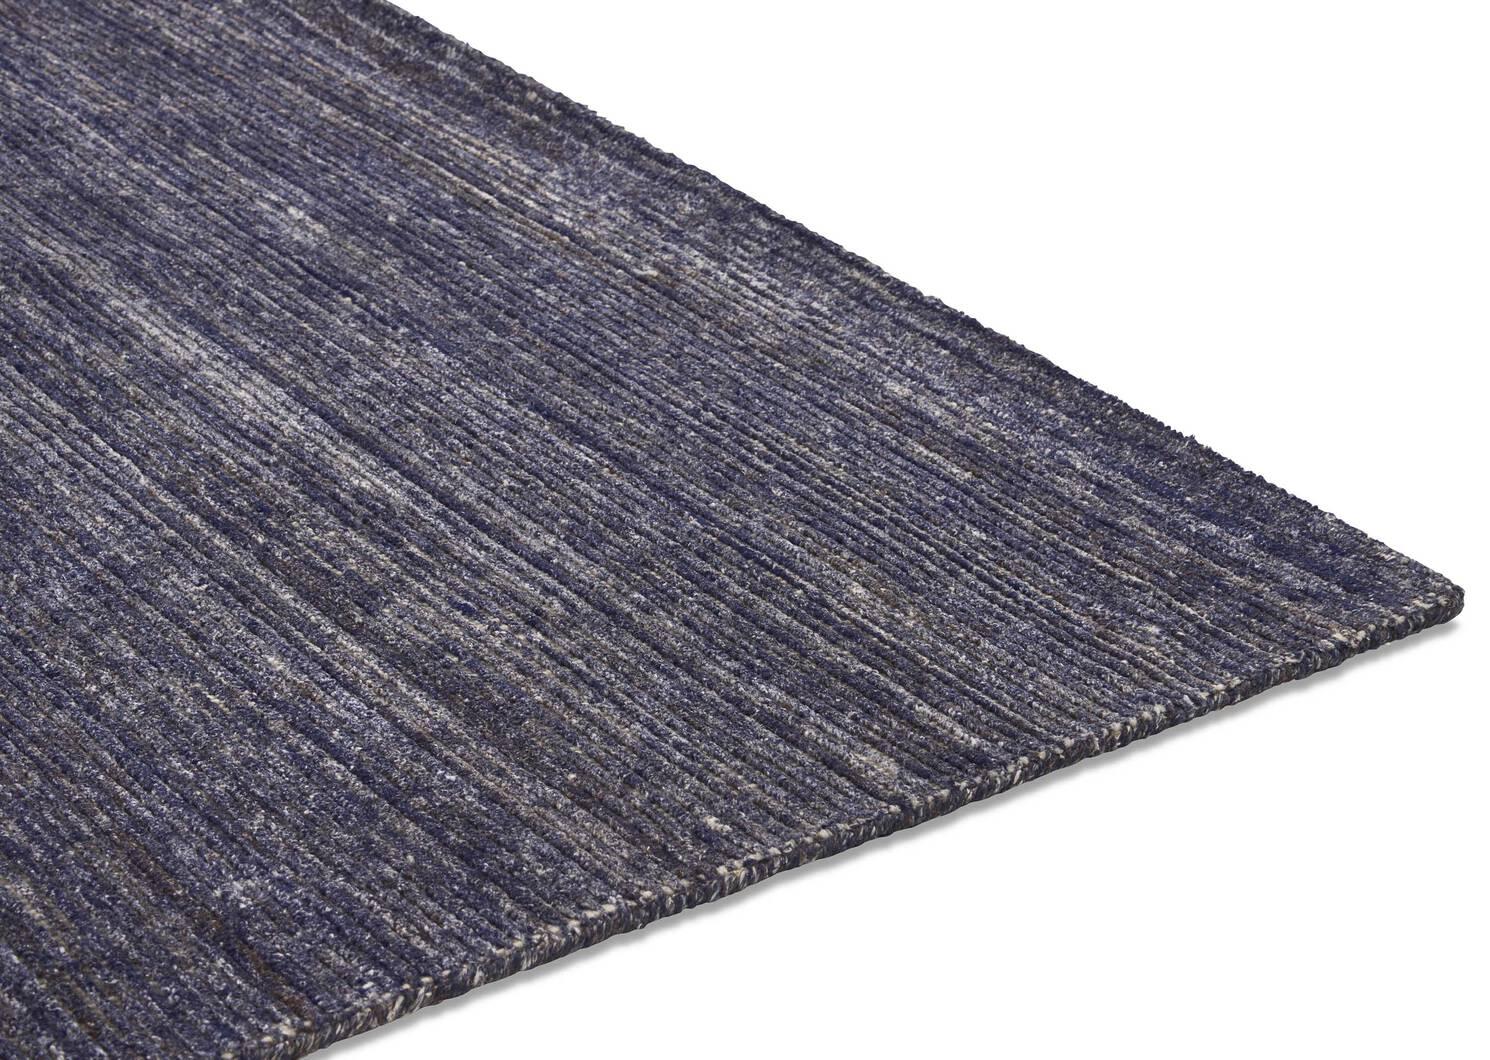 Tapis Bainbridge 96x120 bleu foncé/ivoir